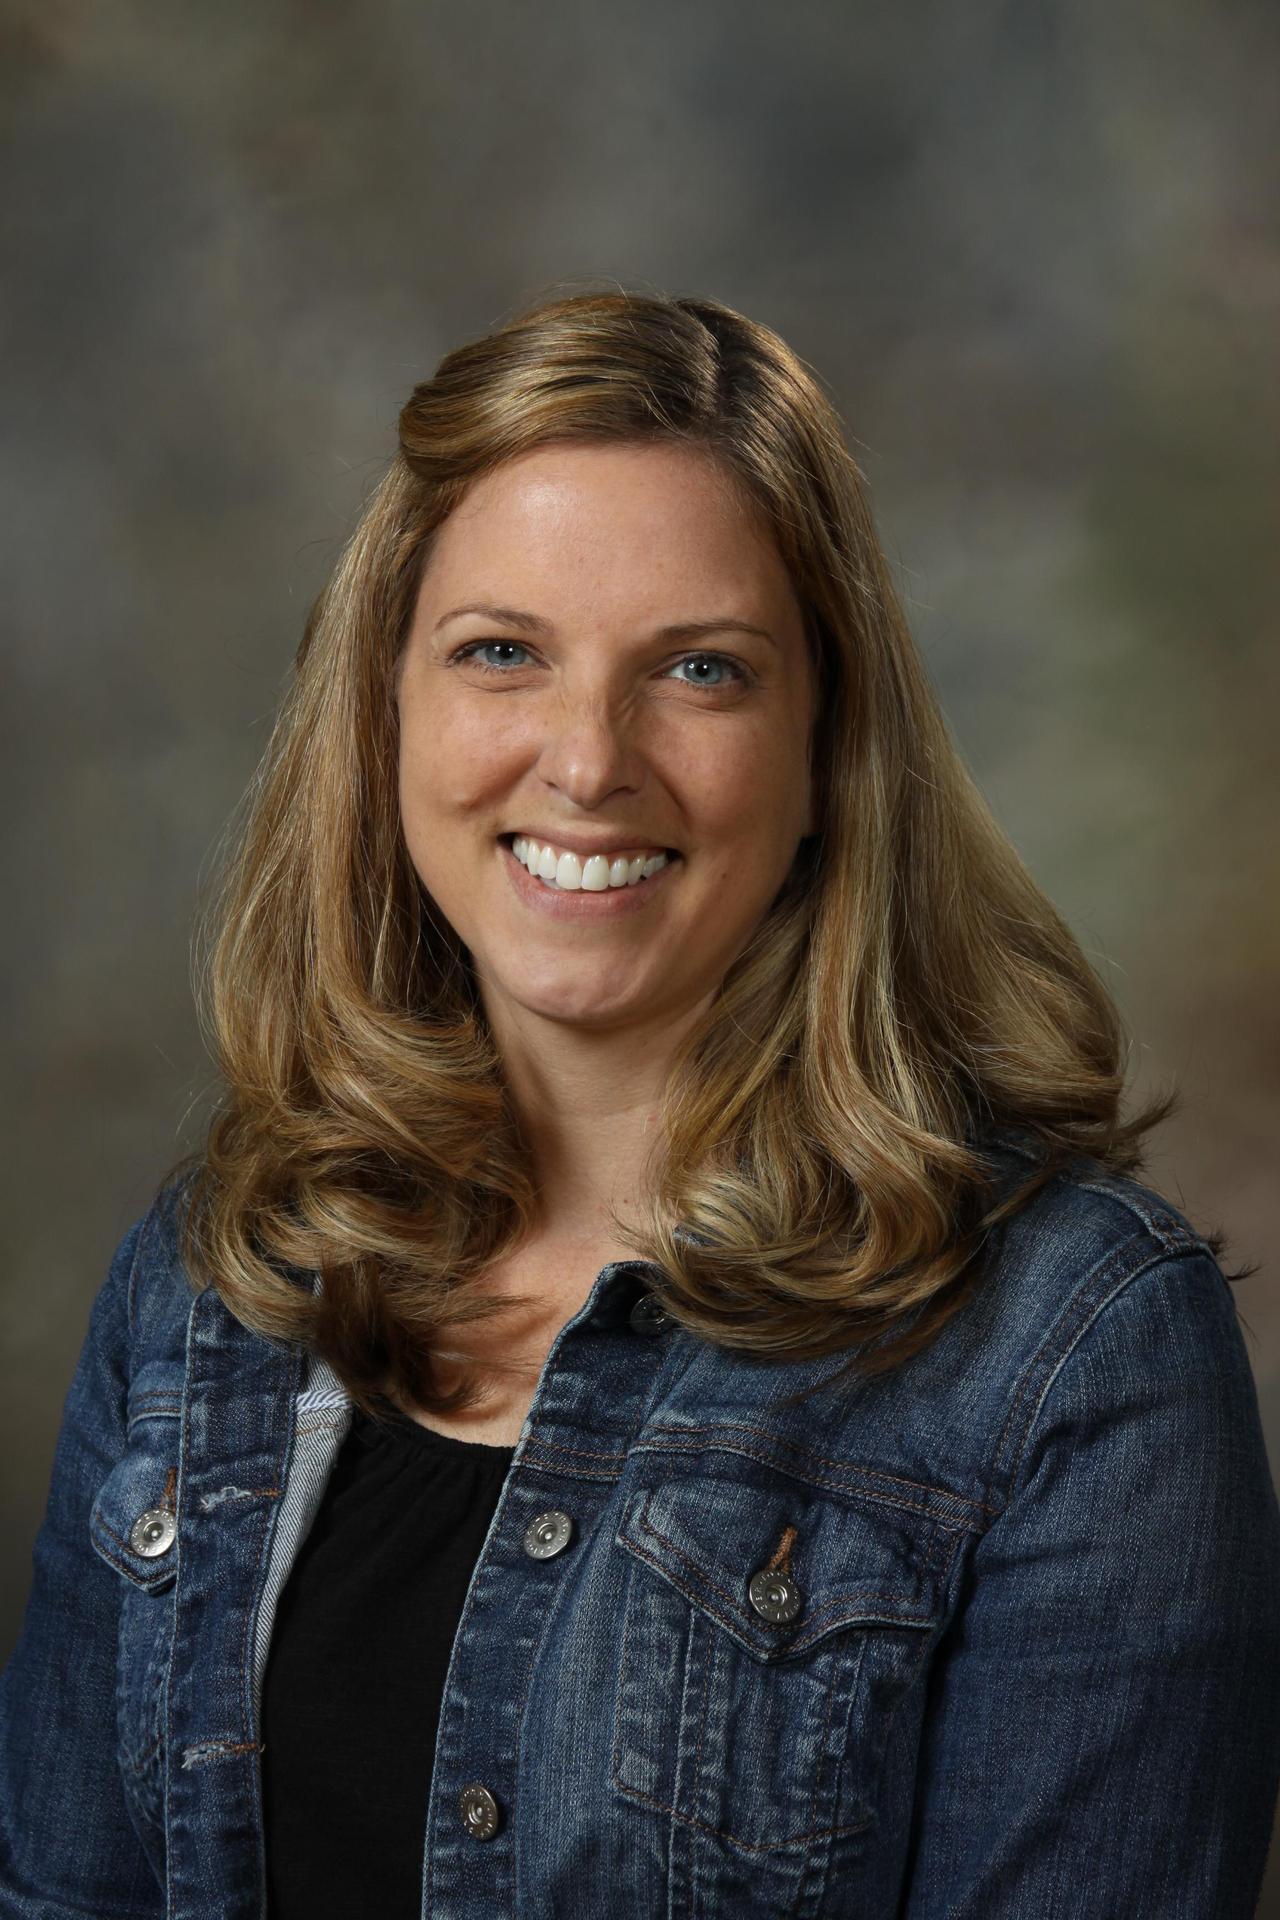 Mrs. Lori Patrick